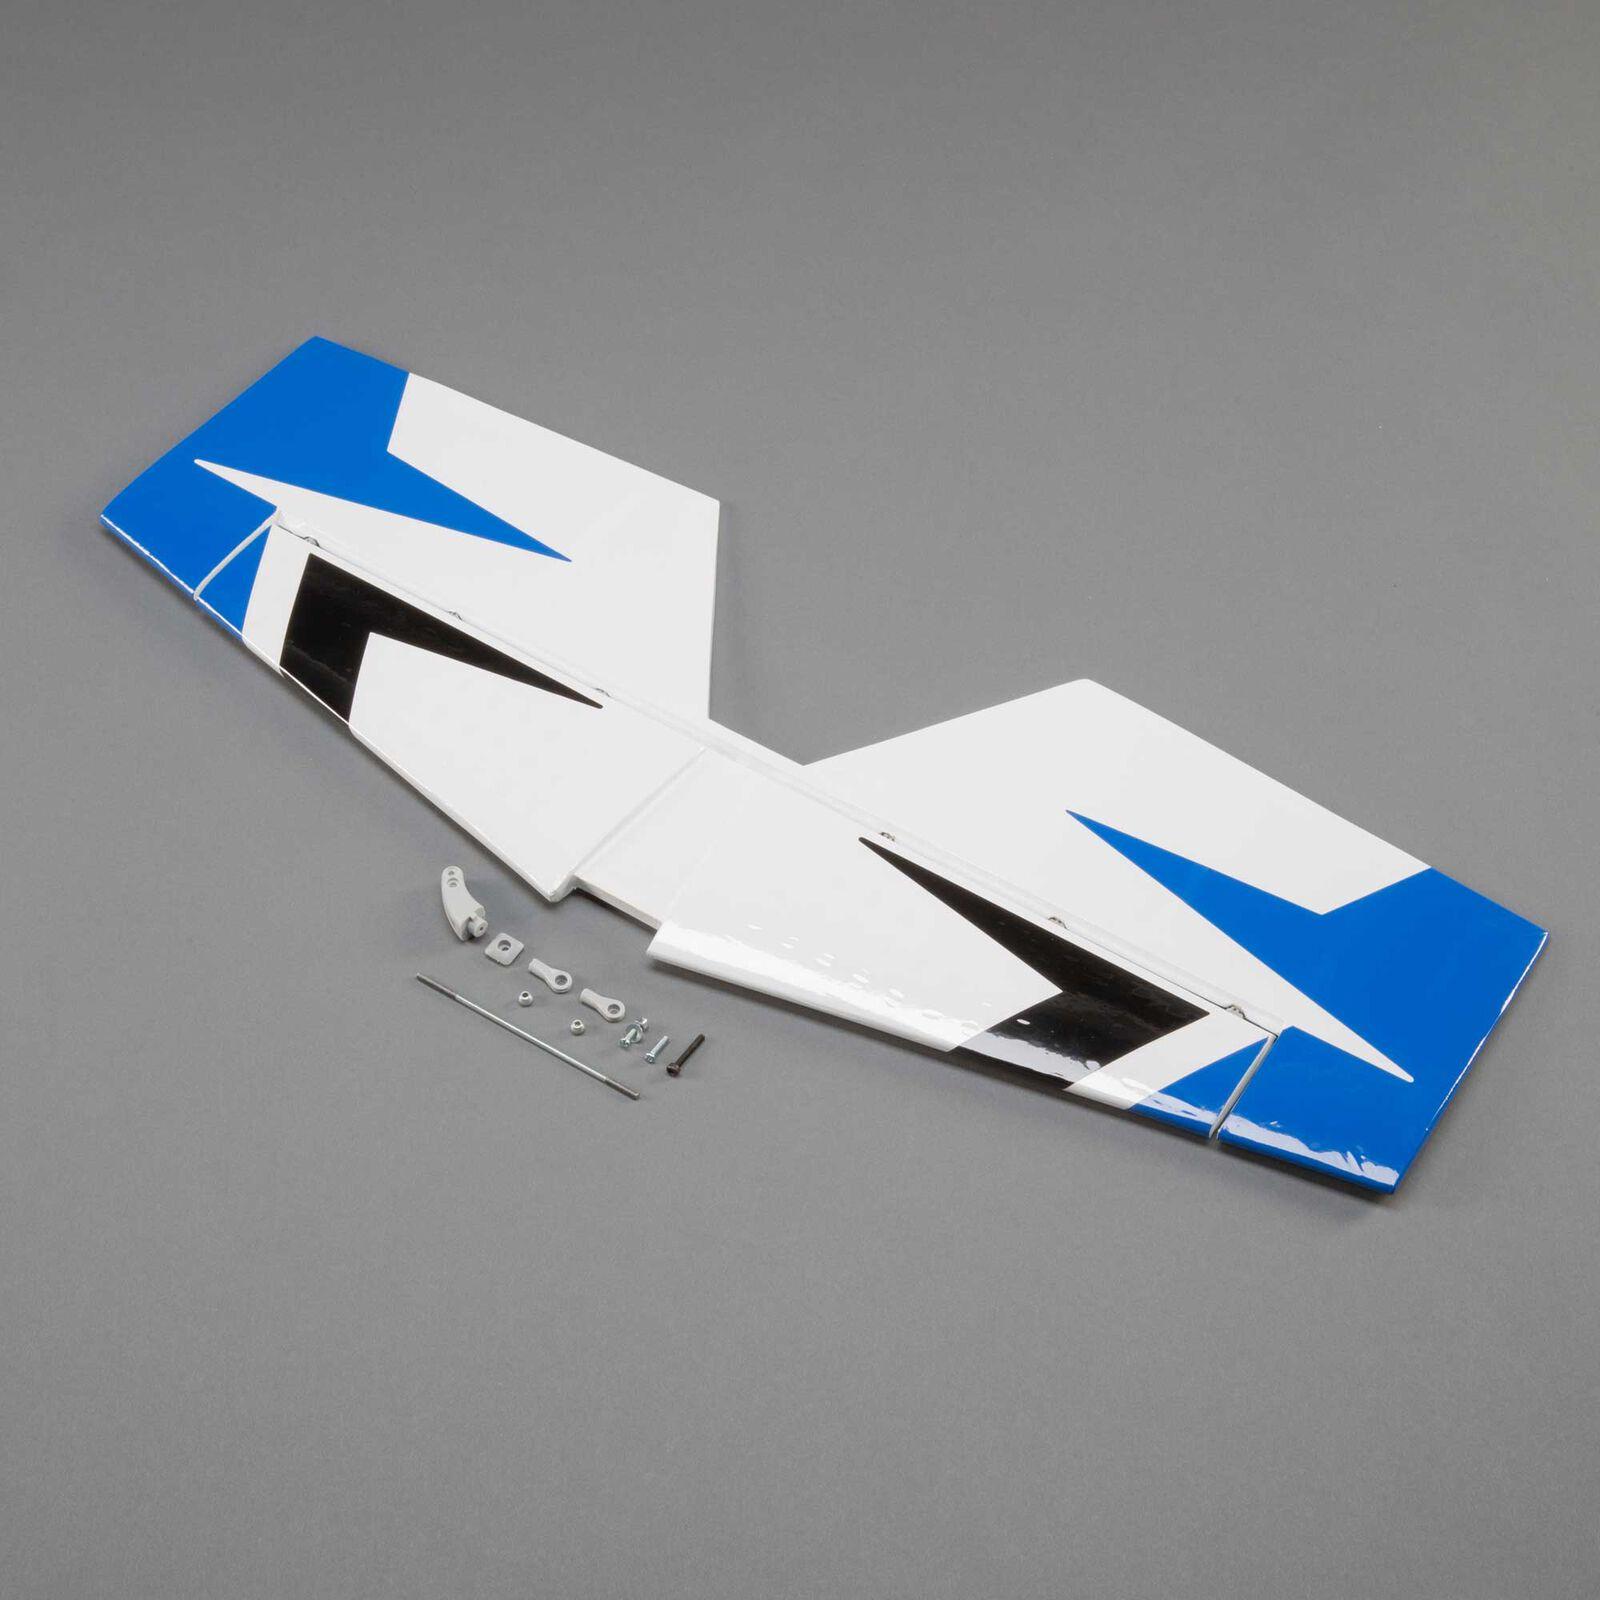 "Stabilizer: Slick Aerobat EP 1.20-20cc ARF 67"""